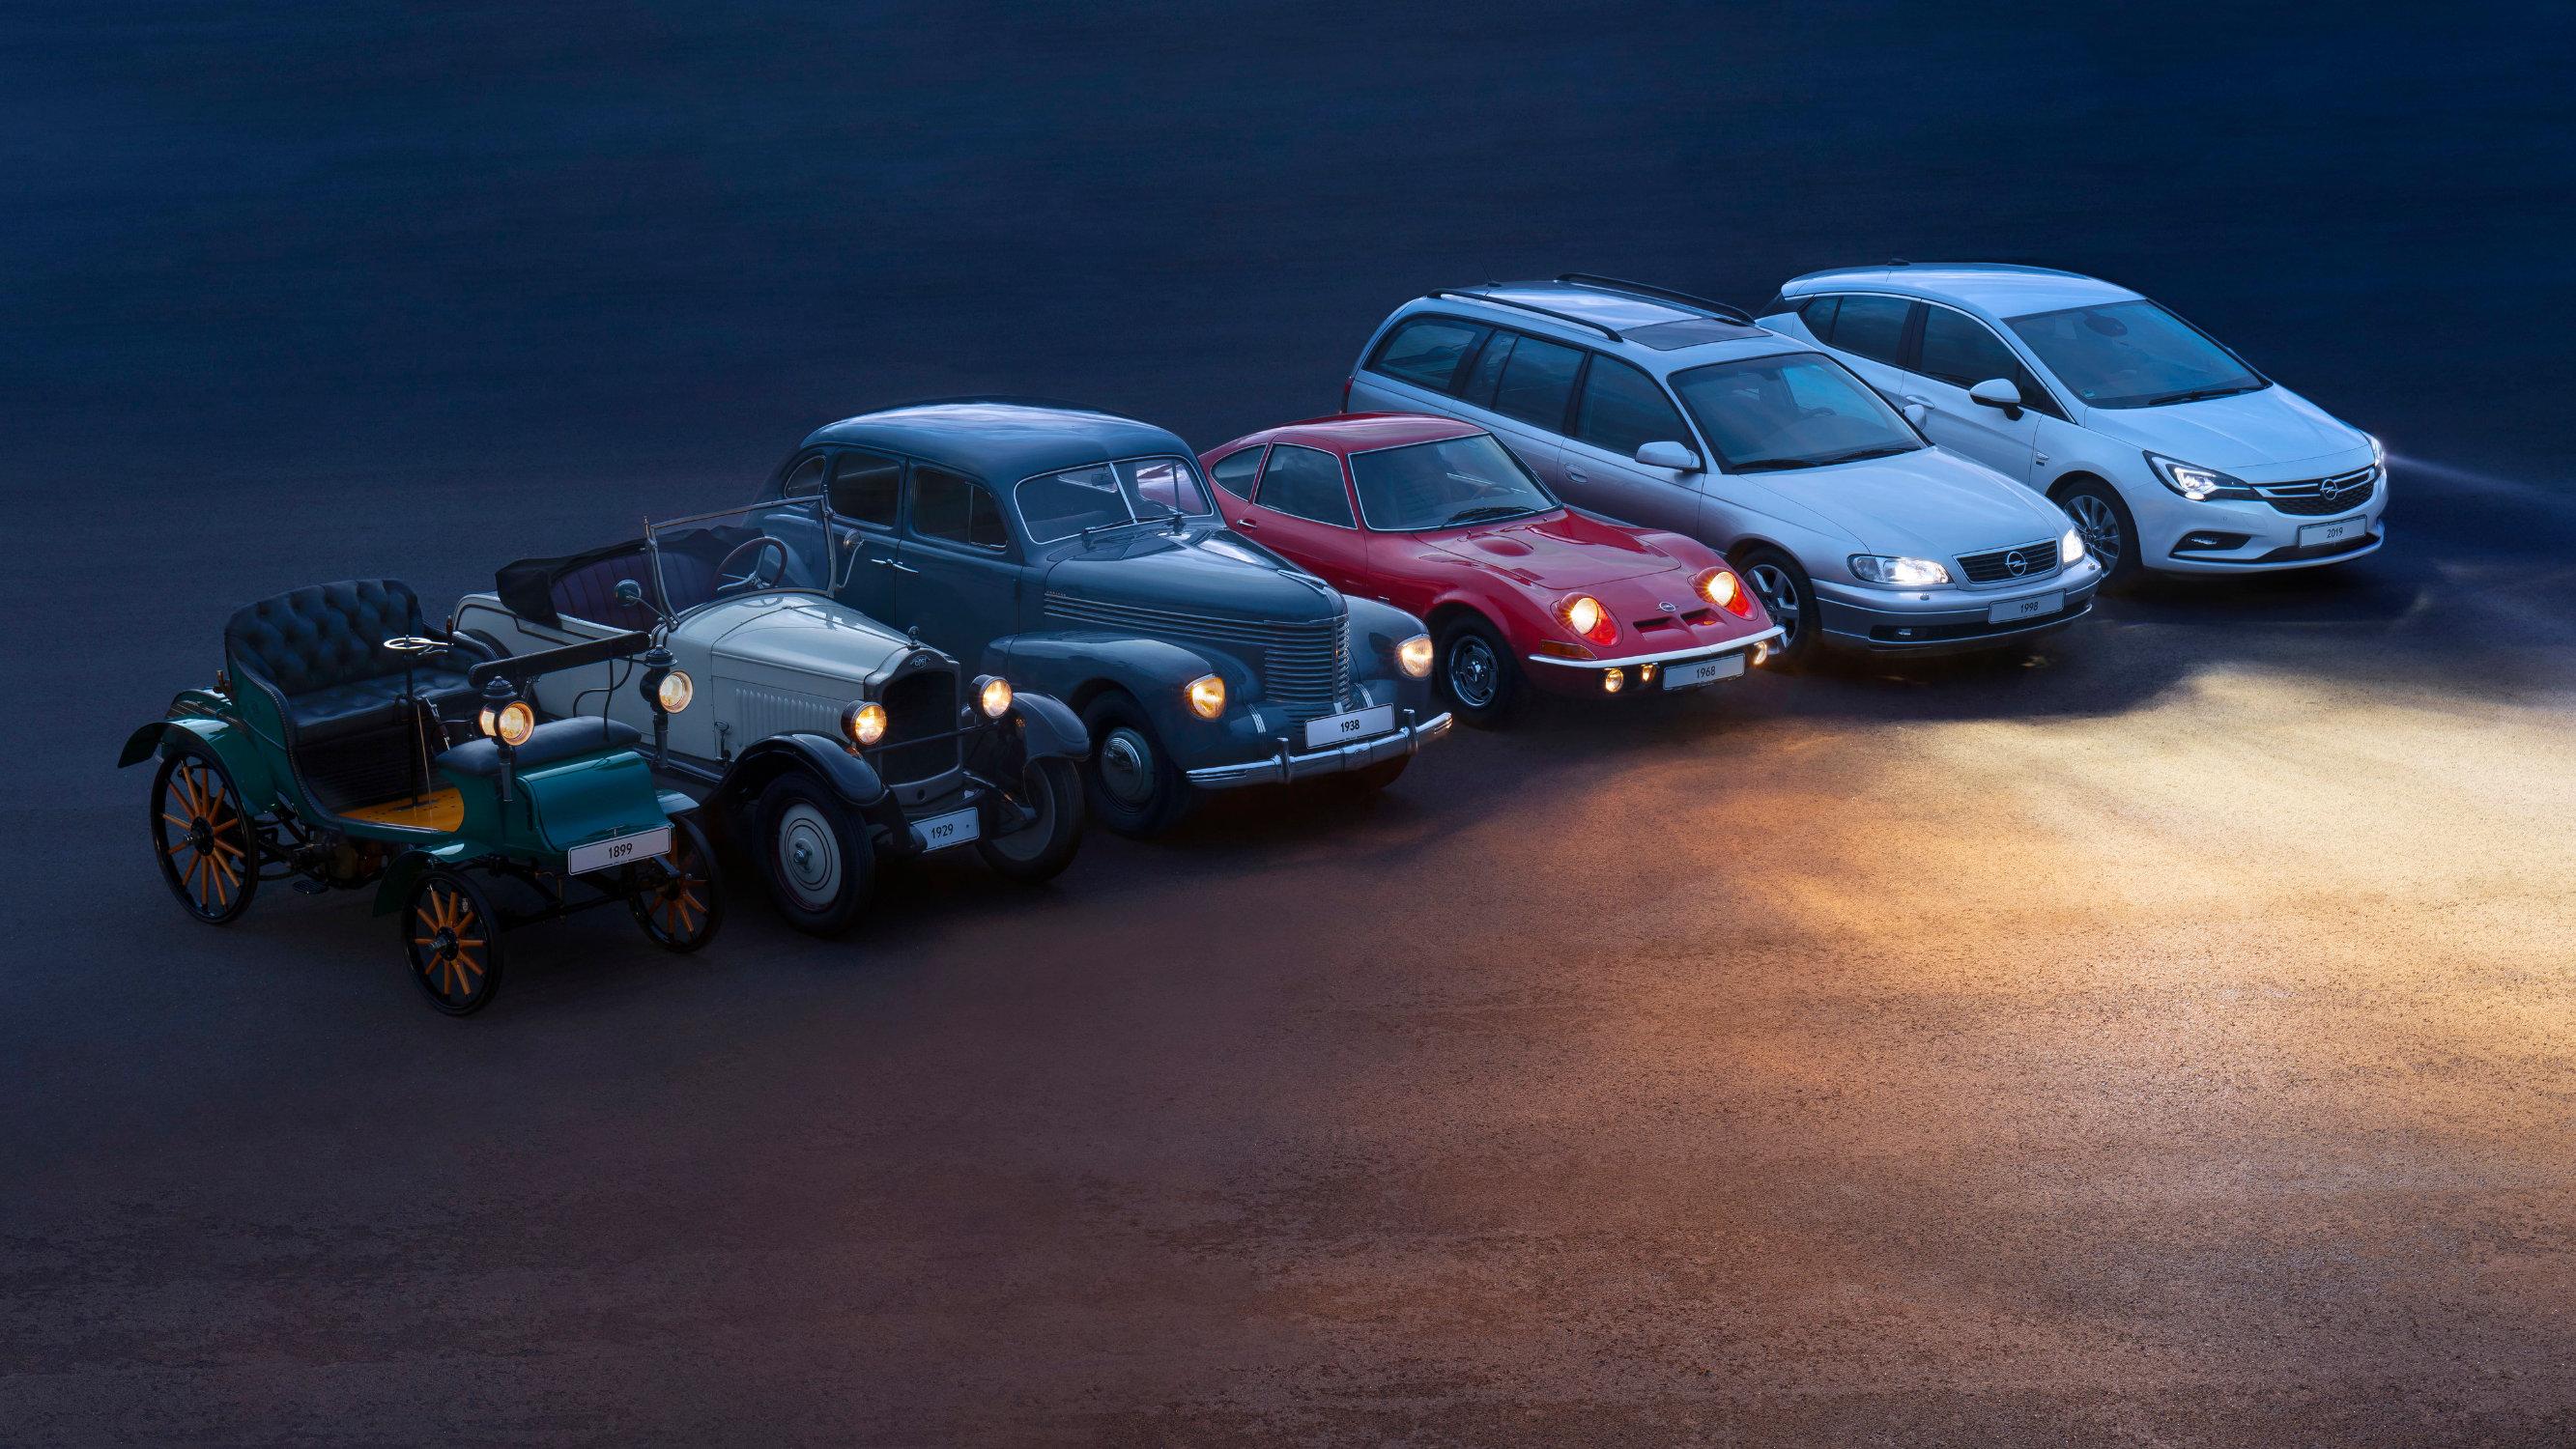 1899 Opel Patentmotorwagen System Lutzmann - 1929 Opel 4/20 PS Luxus-Zweisitzer - 1938 Opel Kapitän - 1998 Opel Omega Caravan - 2019 Opel Astra with IntelliLux LED Matrix-Licht